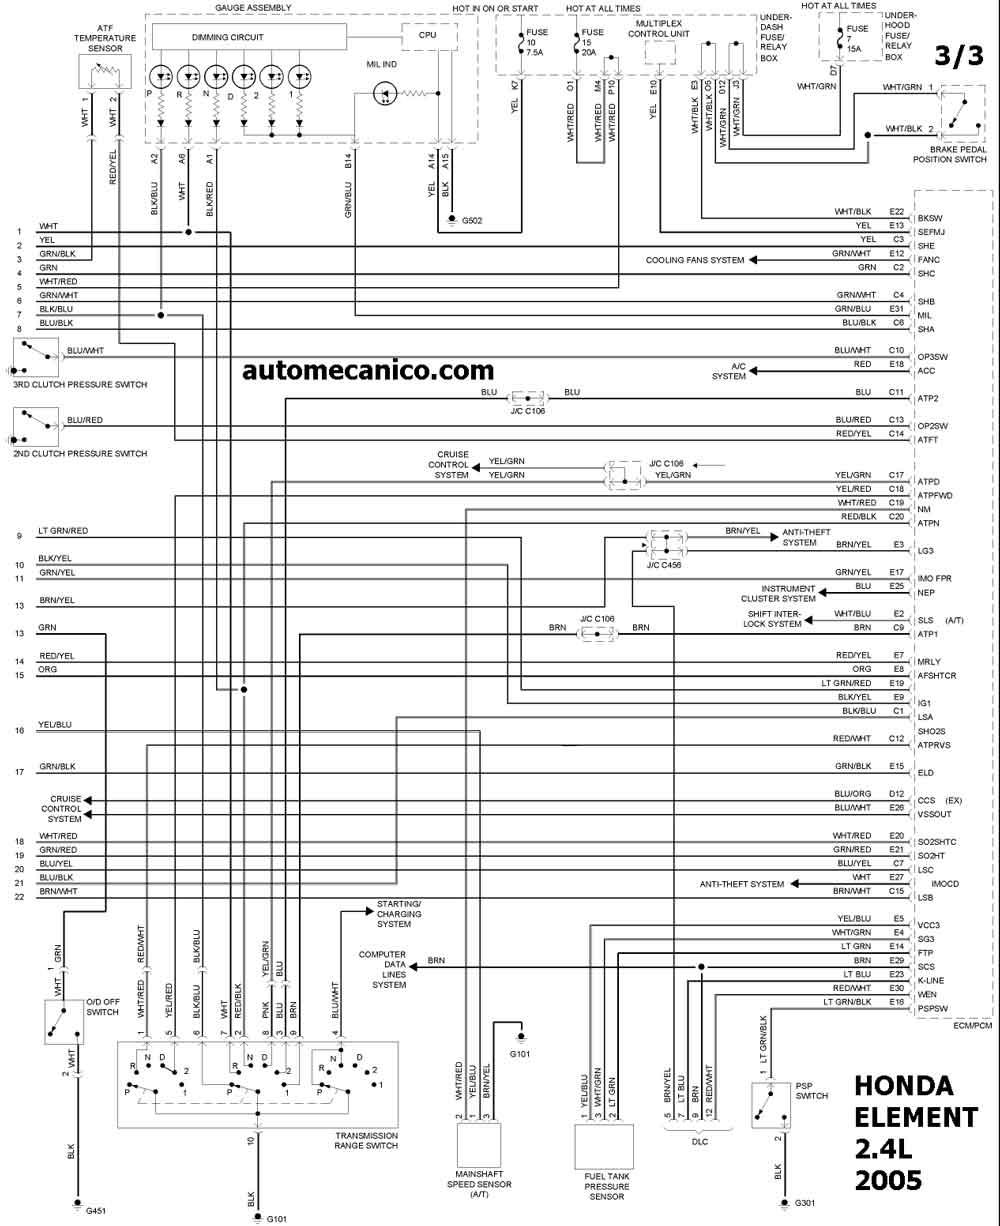 honda 2005 diagramas esquemas graphics vehiculos motores rh autoelectronico com diagrama electrico honda crv 2000 diagrama electrico honda crv 2000